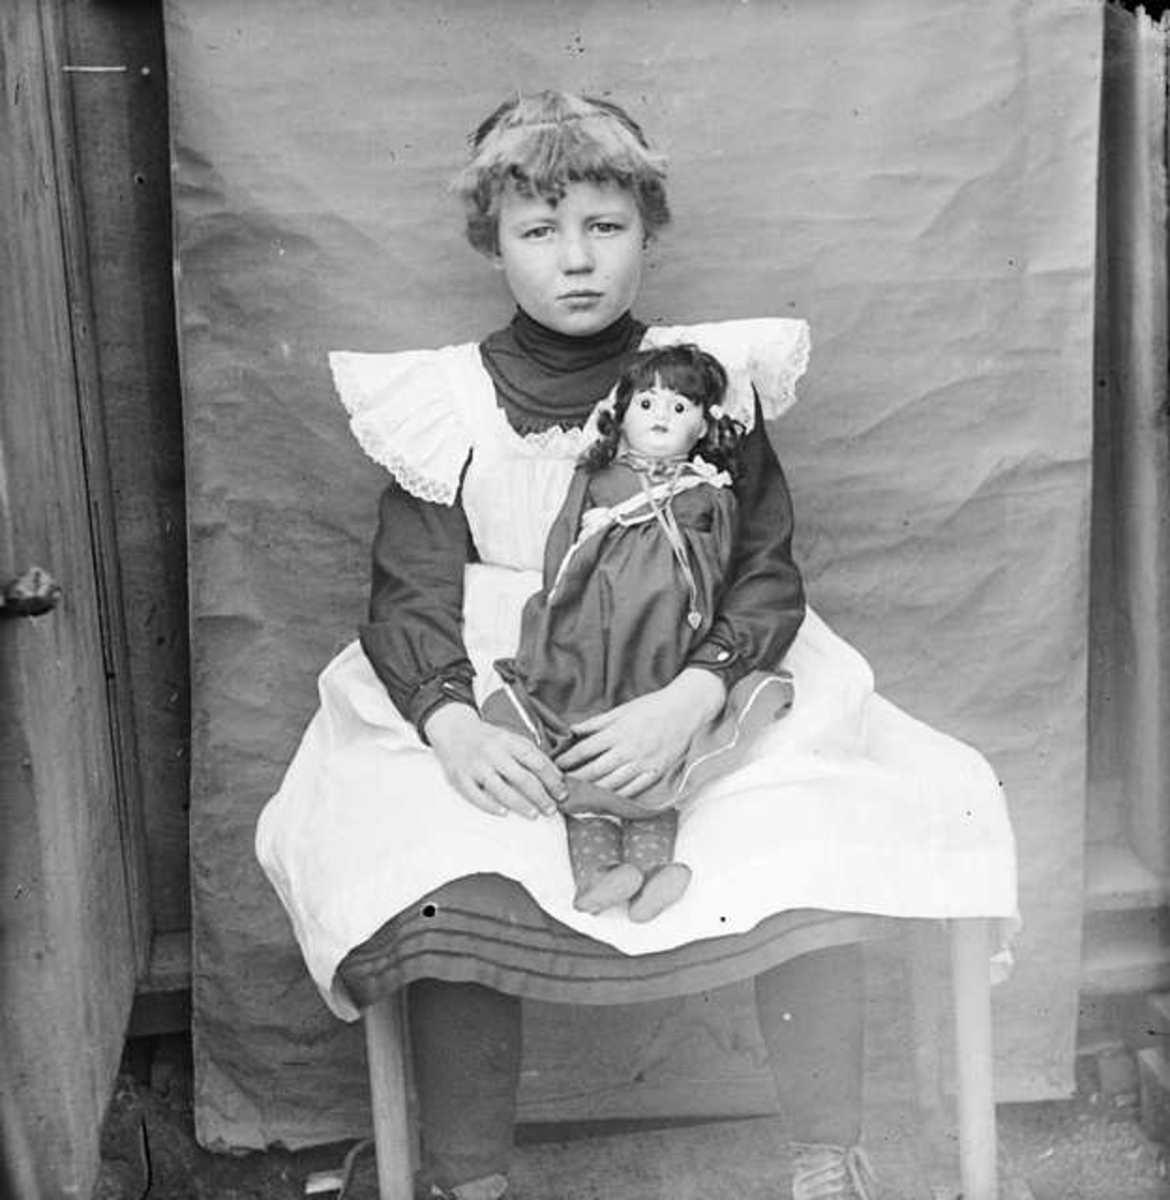 Child Wearing a Pinafore